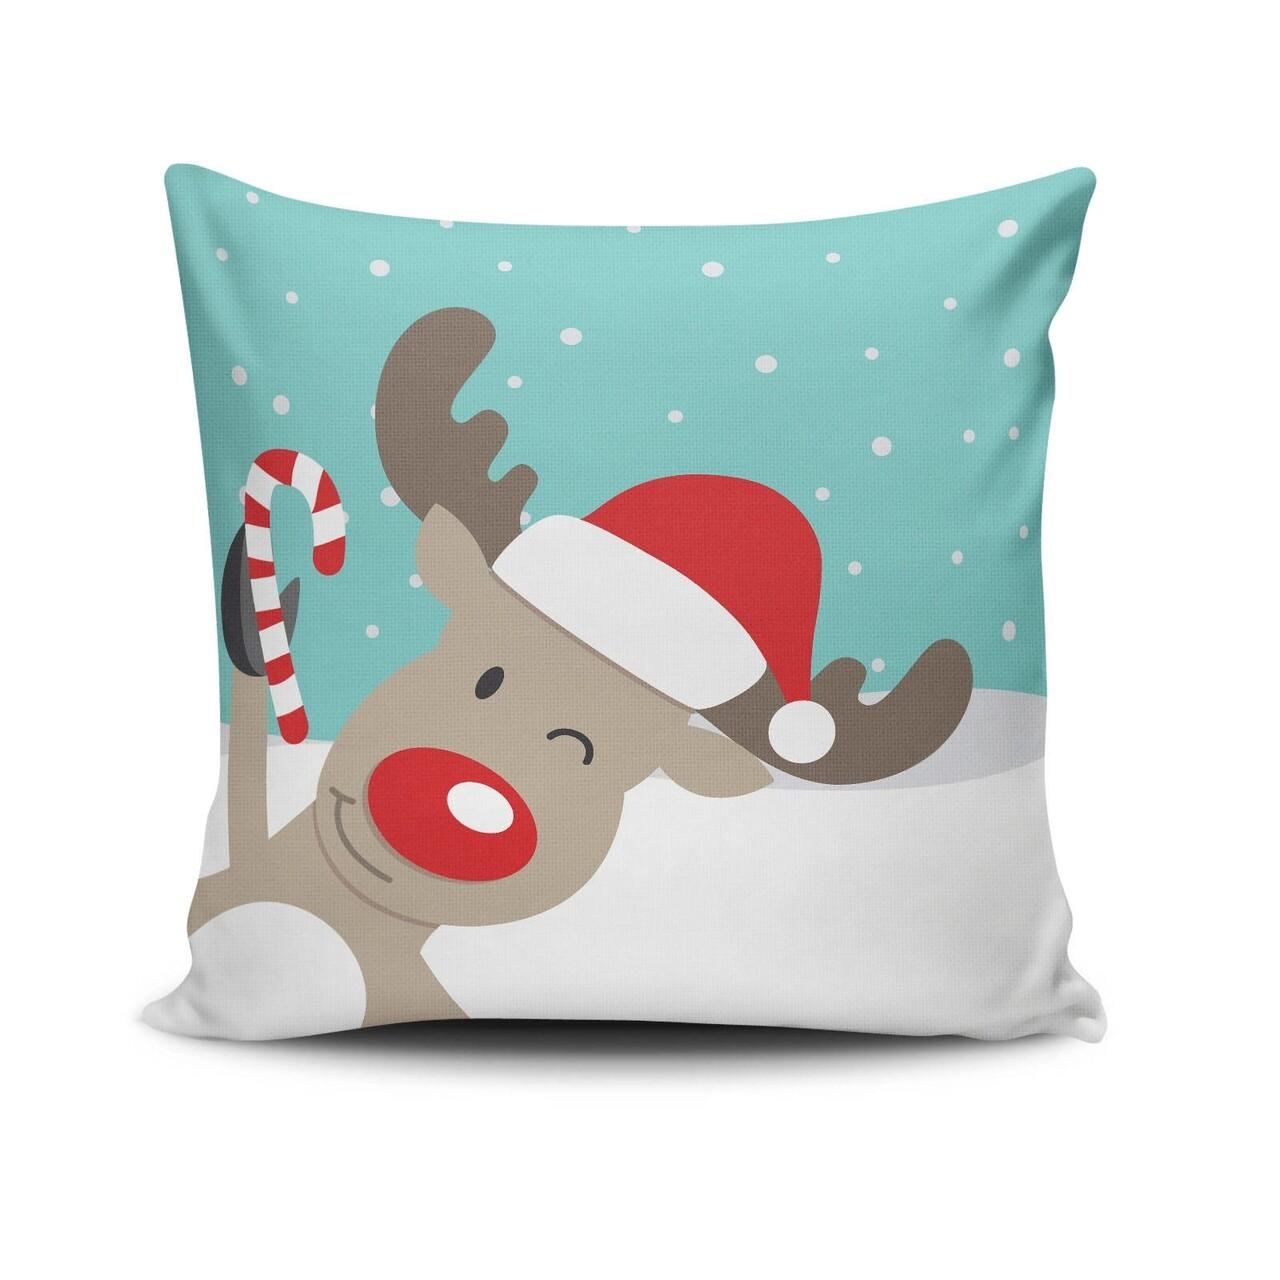 Perna decorativa, Christmas NOELKRLNT-30, 43x43 cm, policoton, multicolor